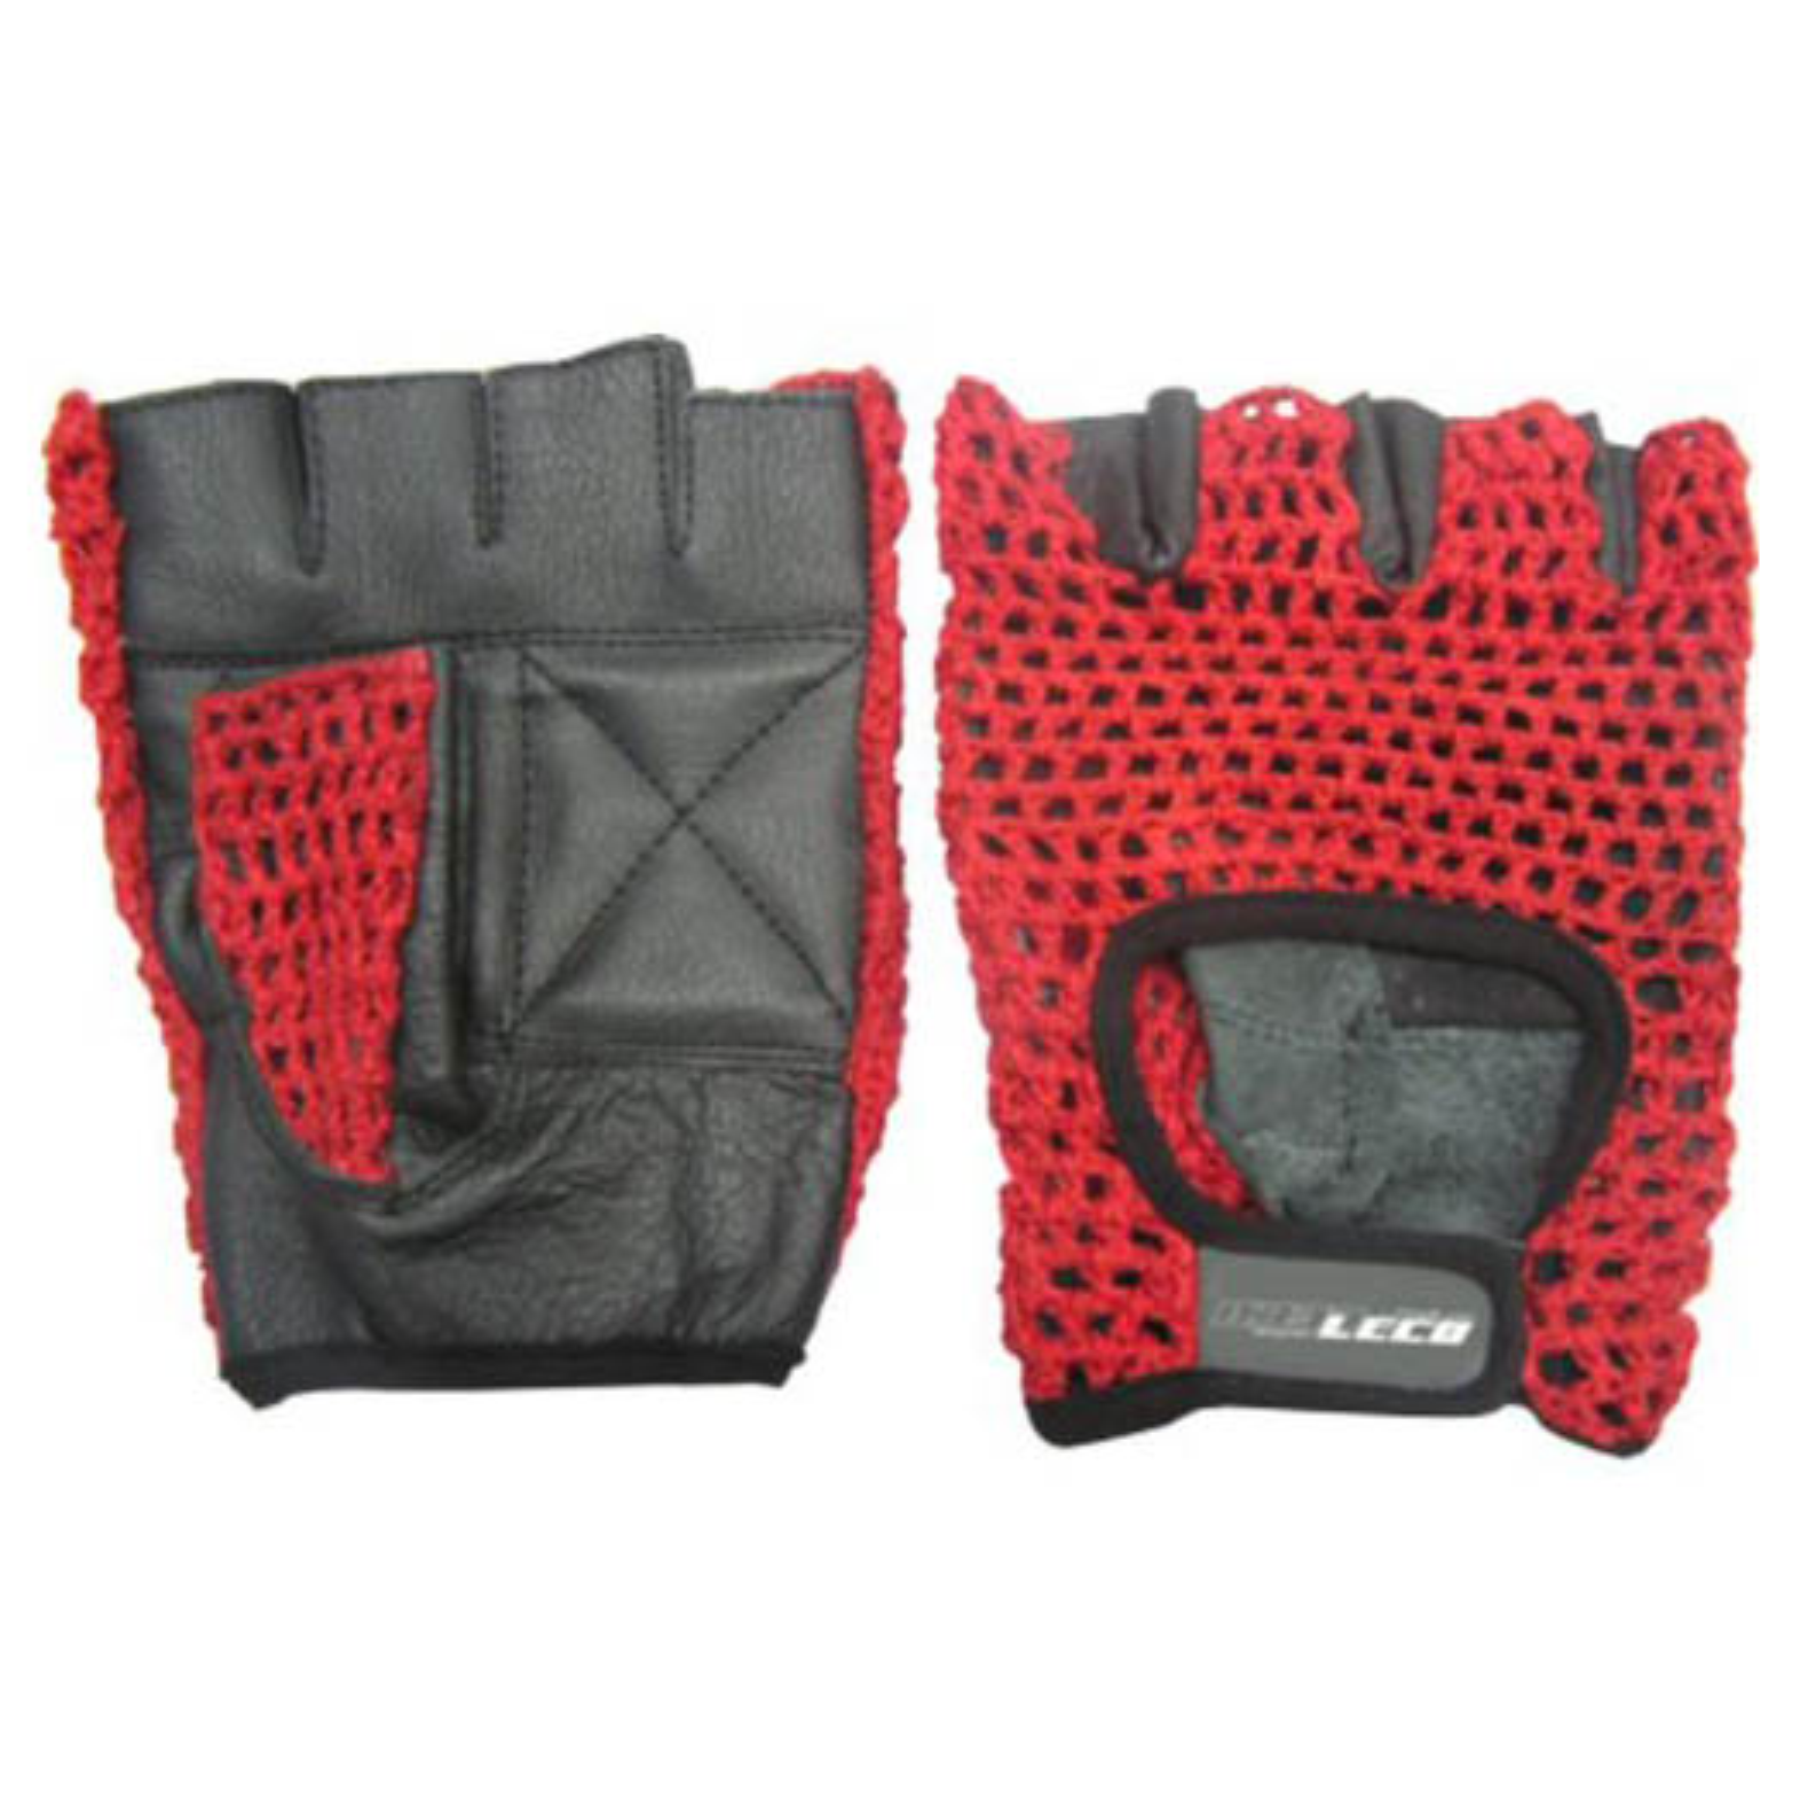 Перчатки для фитнеса ХОУМ кожа/сетка р. L (т11120-3)